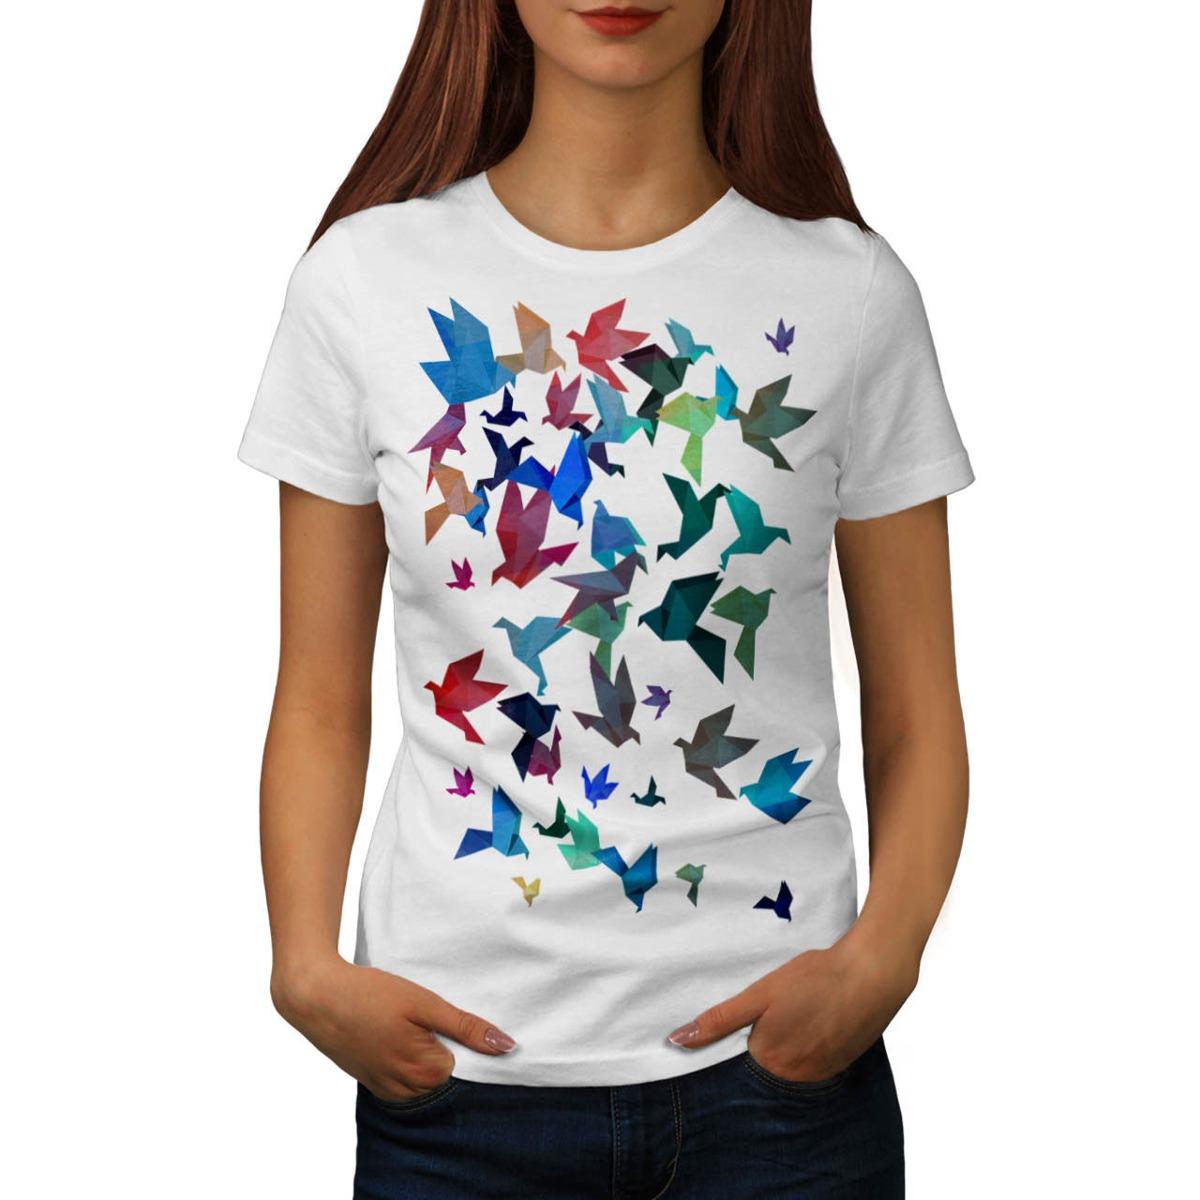 Remera origami con arte de mujer 25000 en mercado libre thecheapjerseys Images